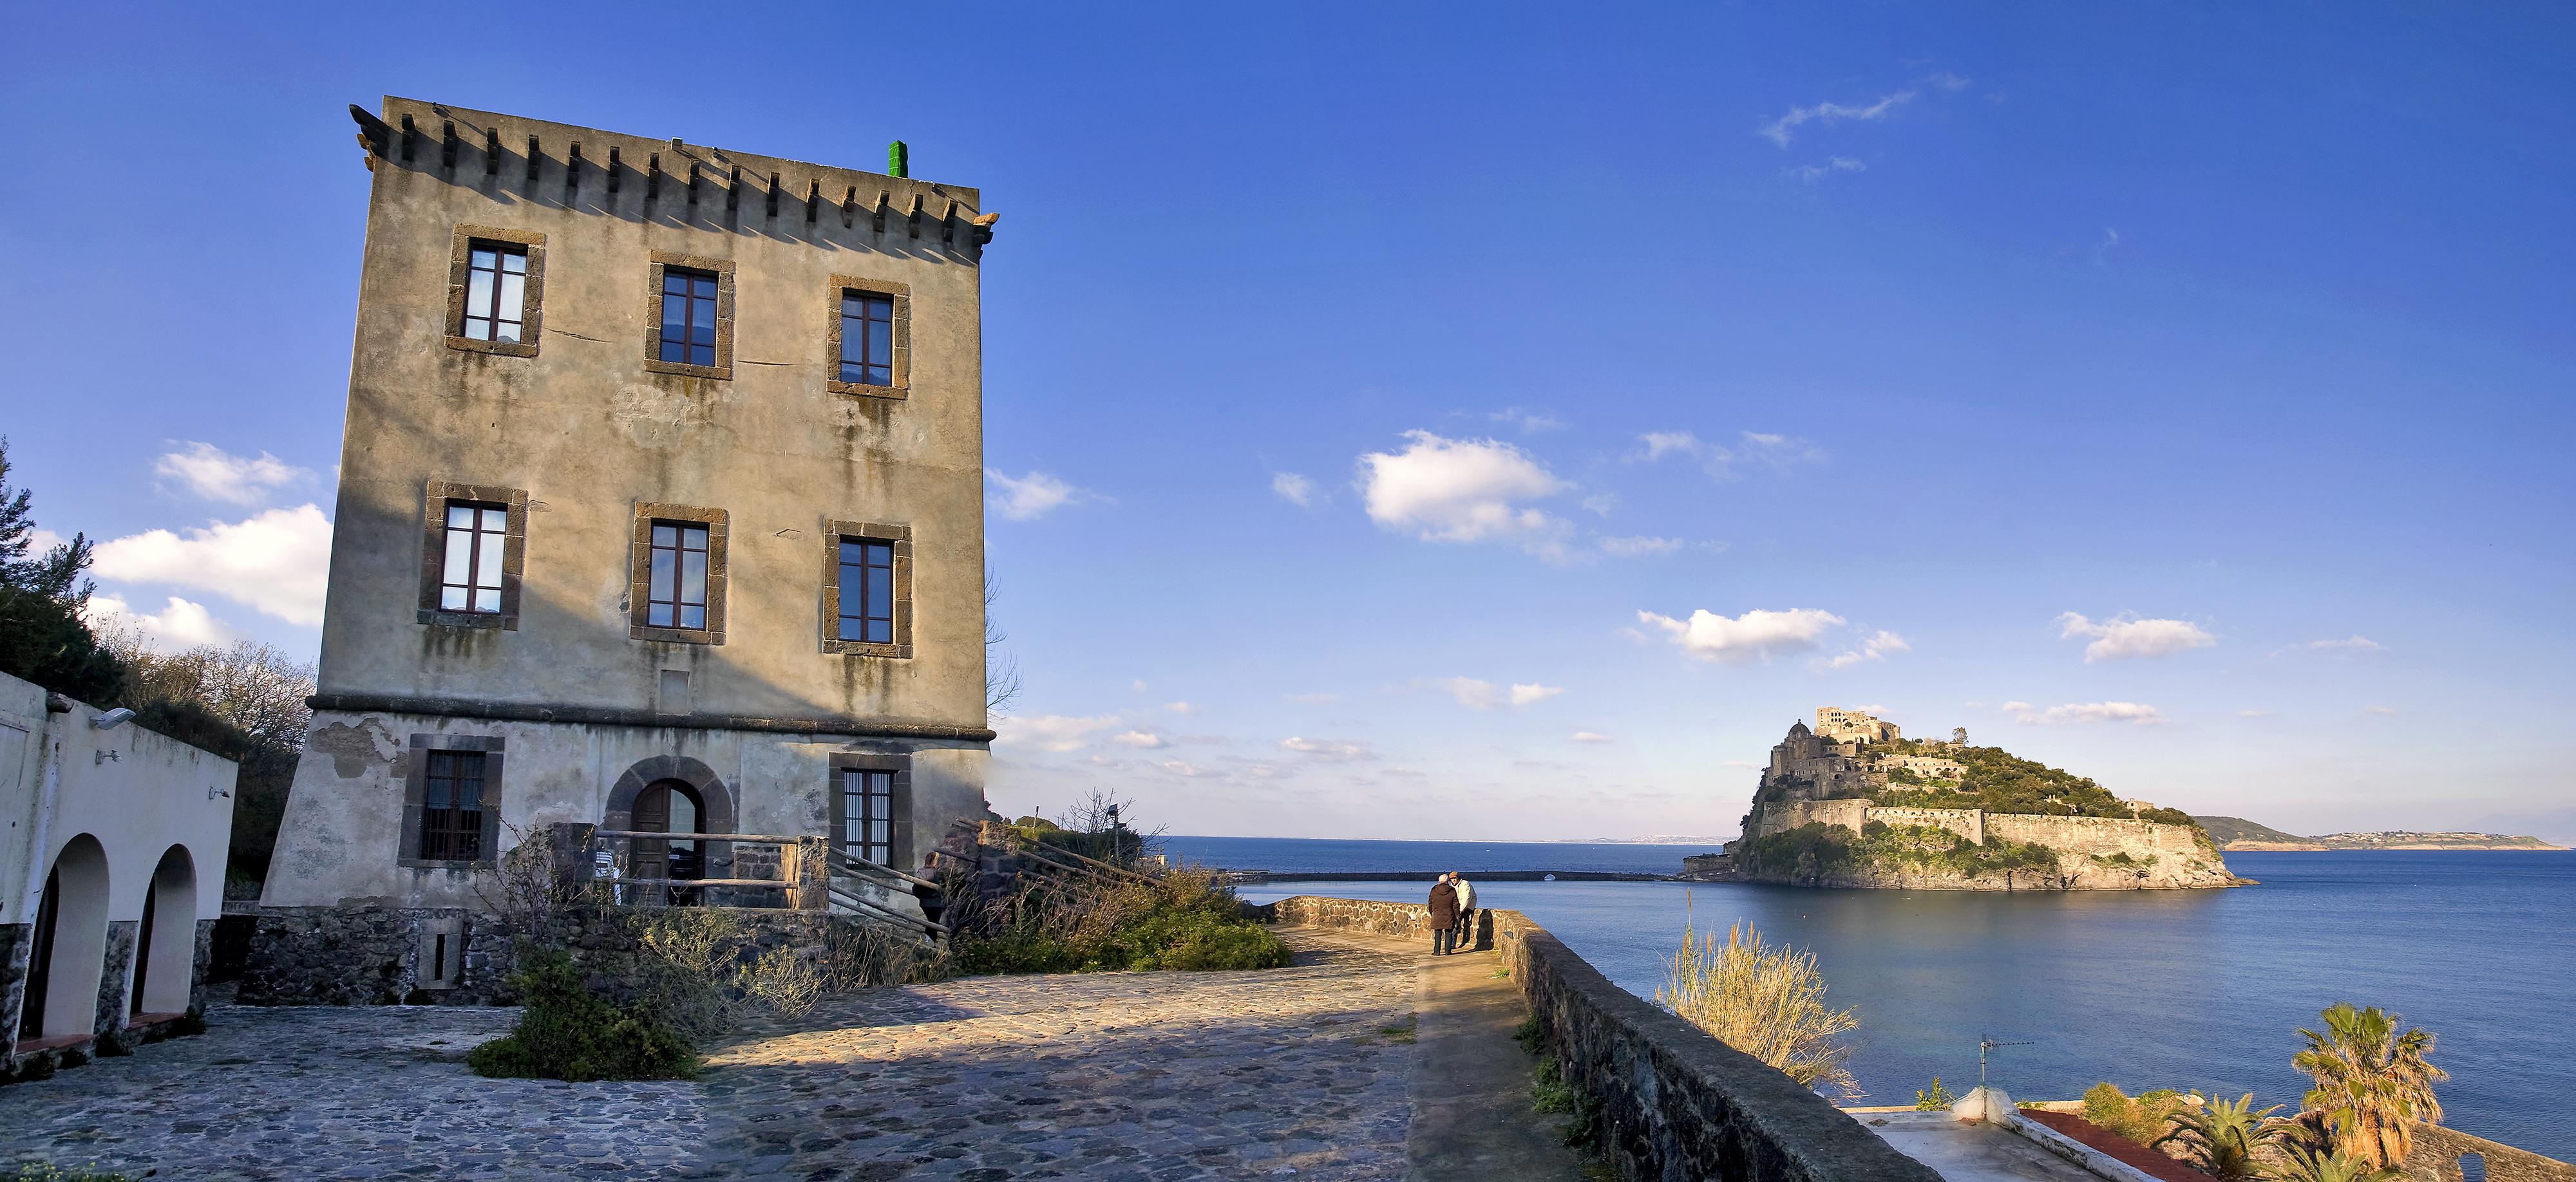 Ischia Ponte - Torre di Guevara e Castello Aragonese